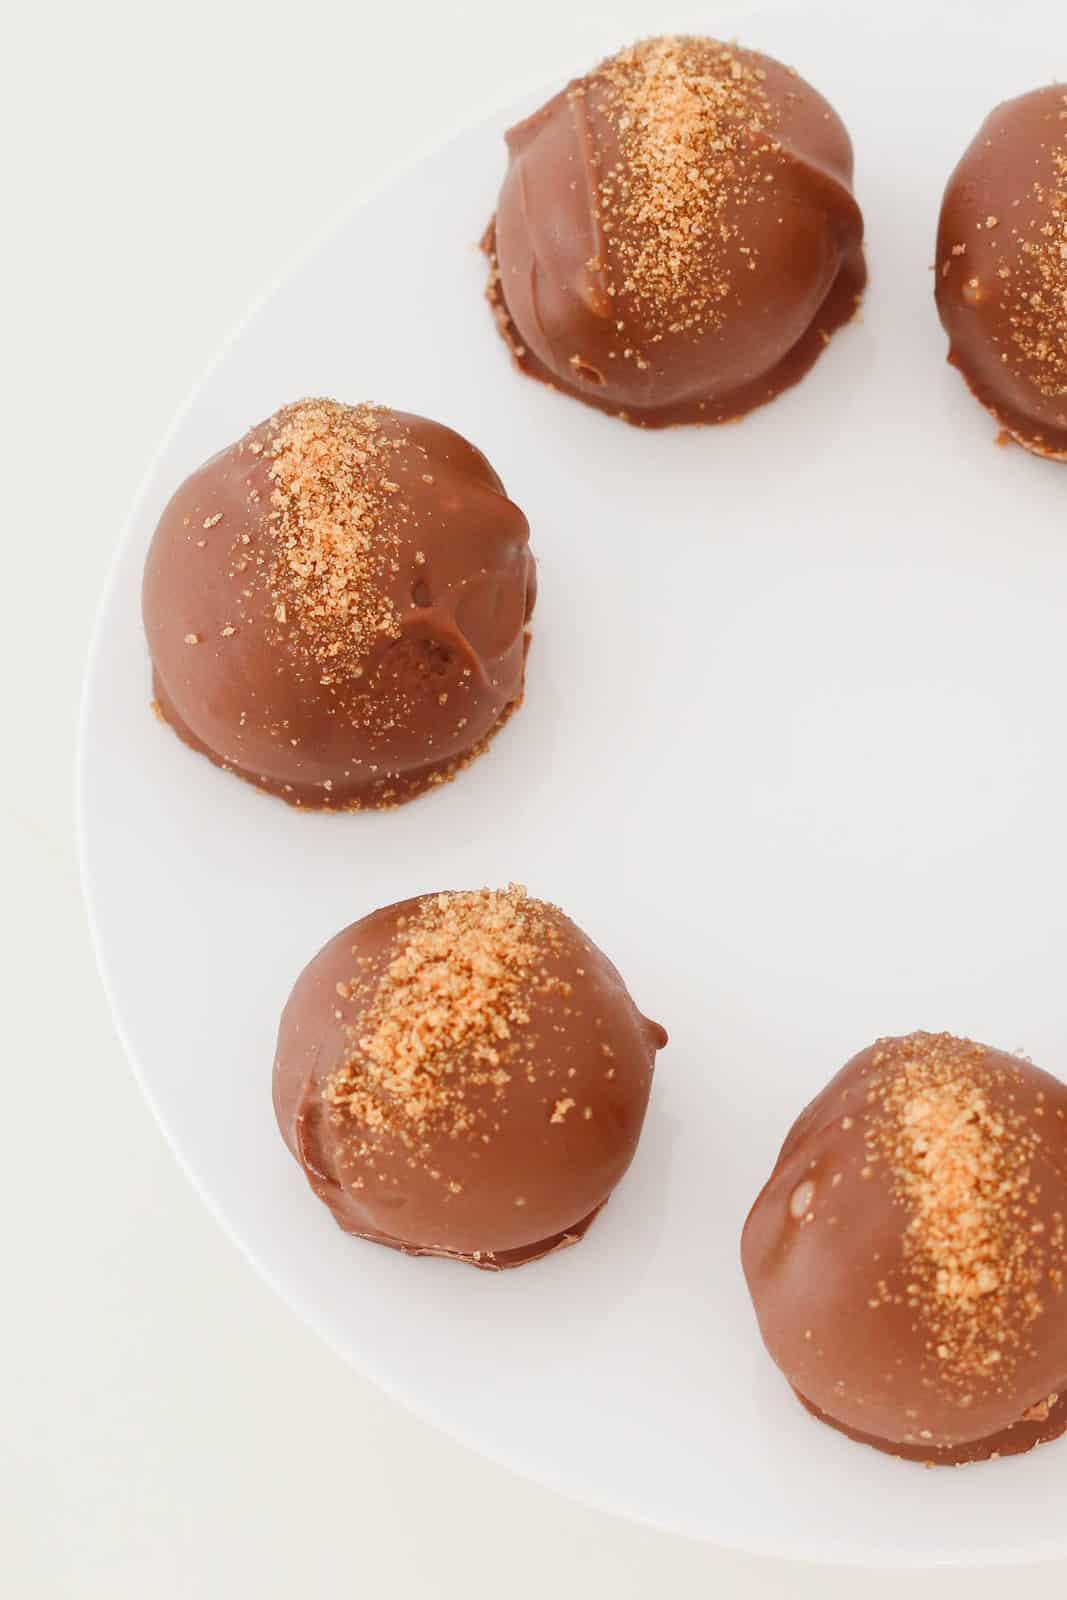 Gold sugar sprinkled over chocolate coated caramel Tim Tam cheesecake balls.